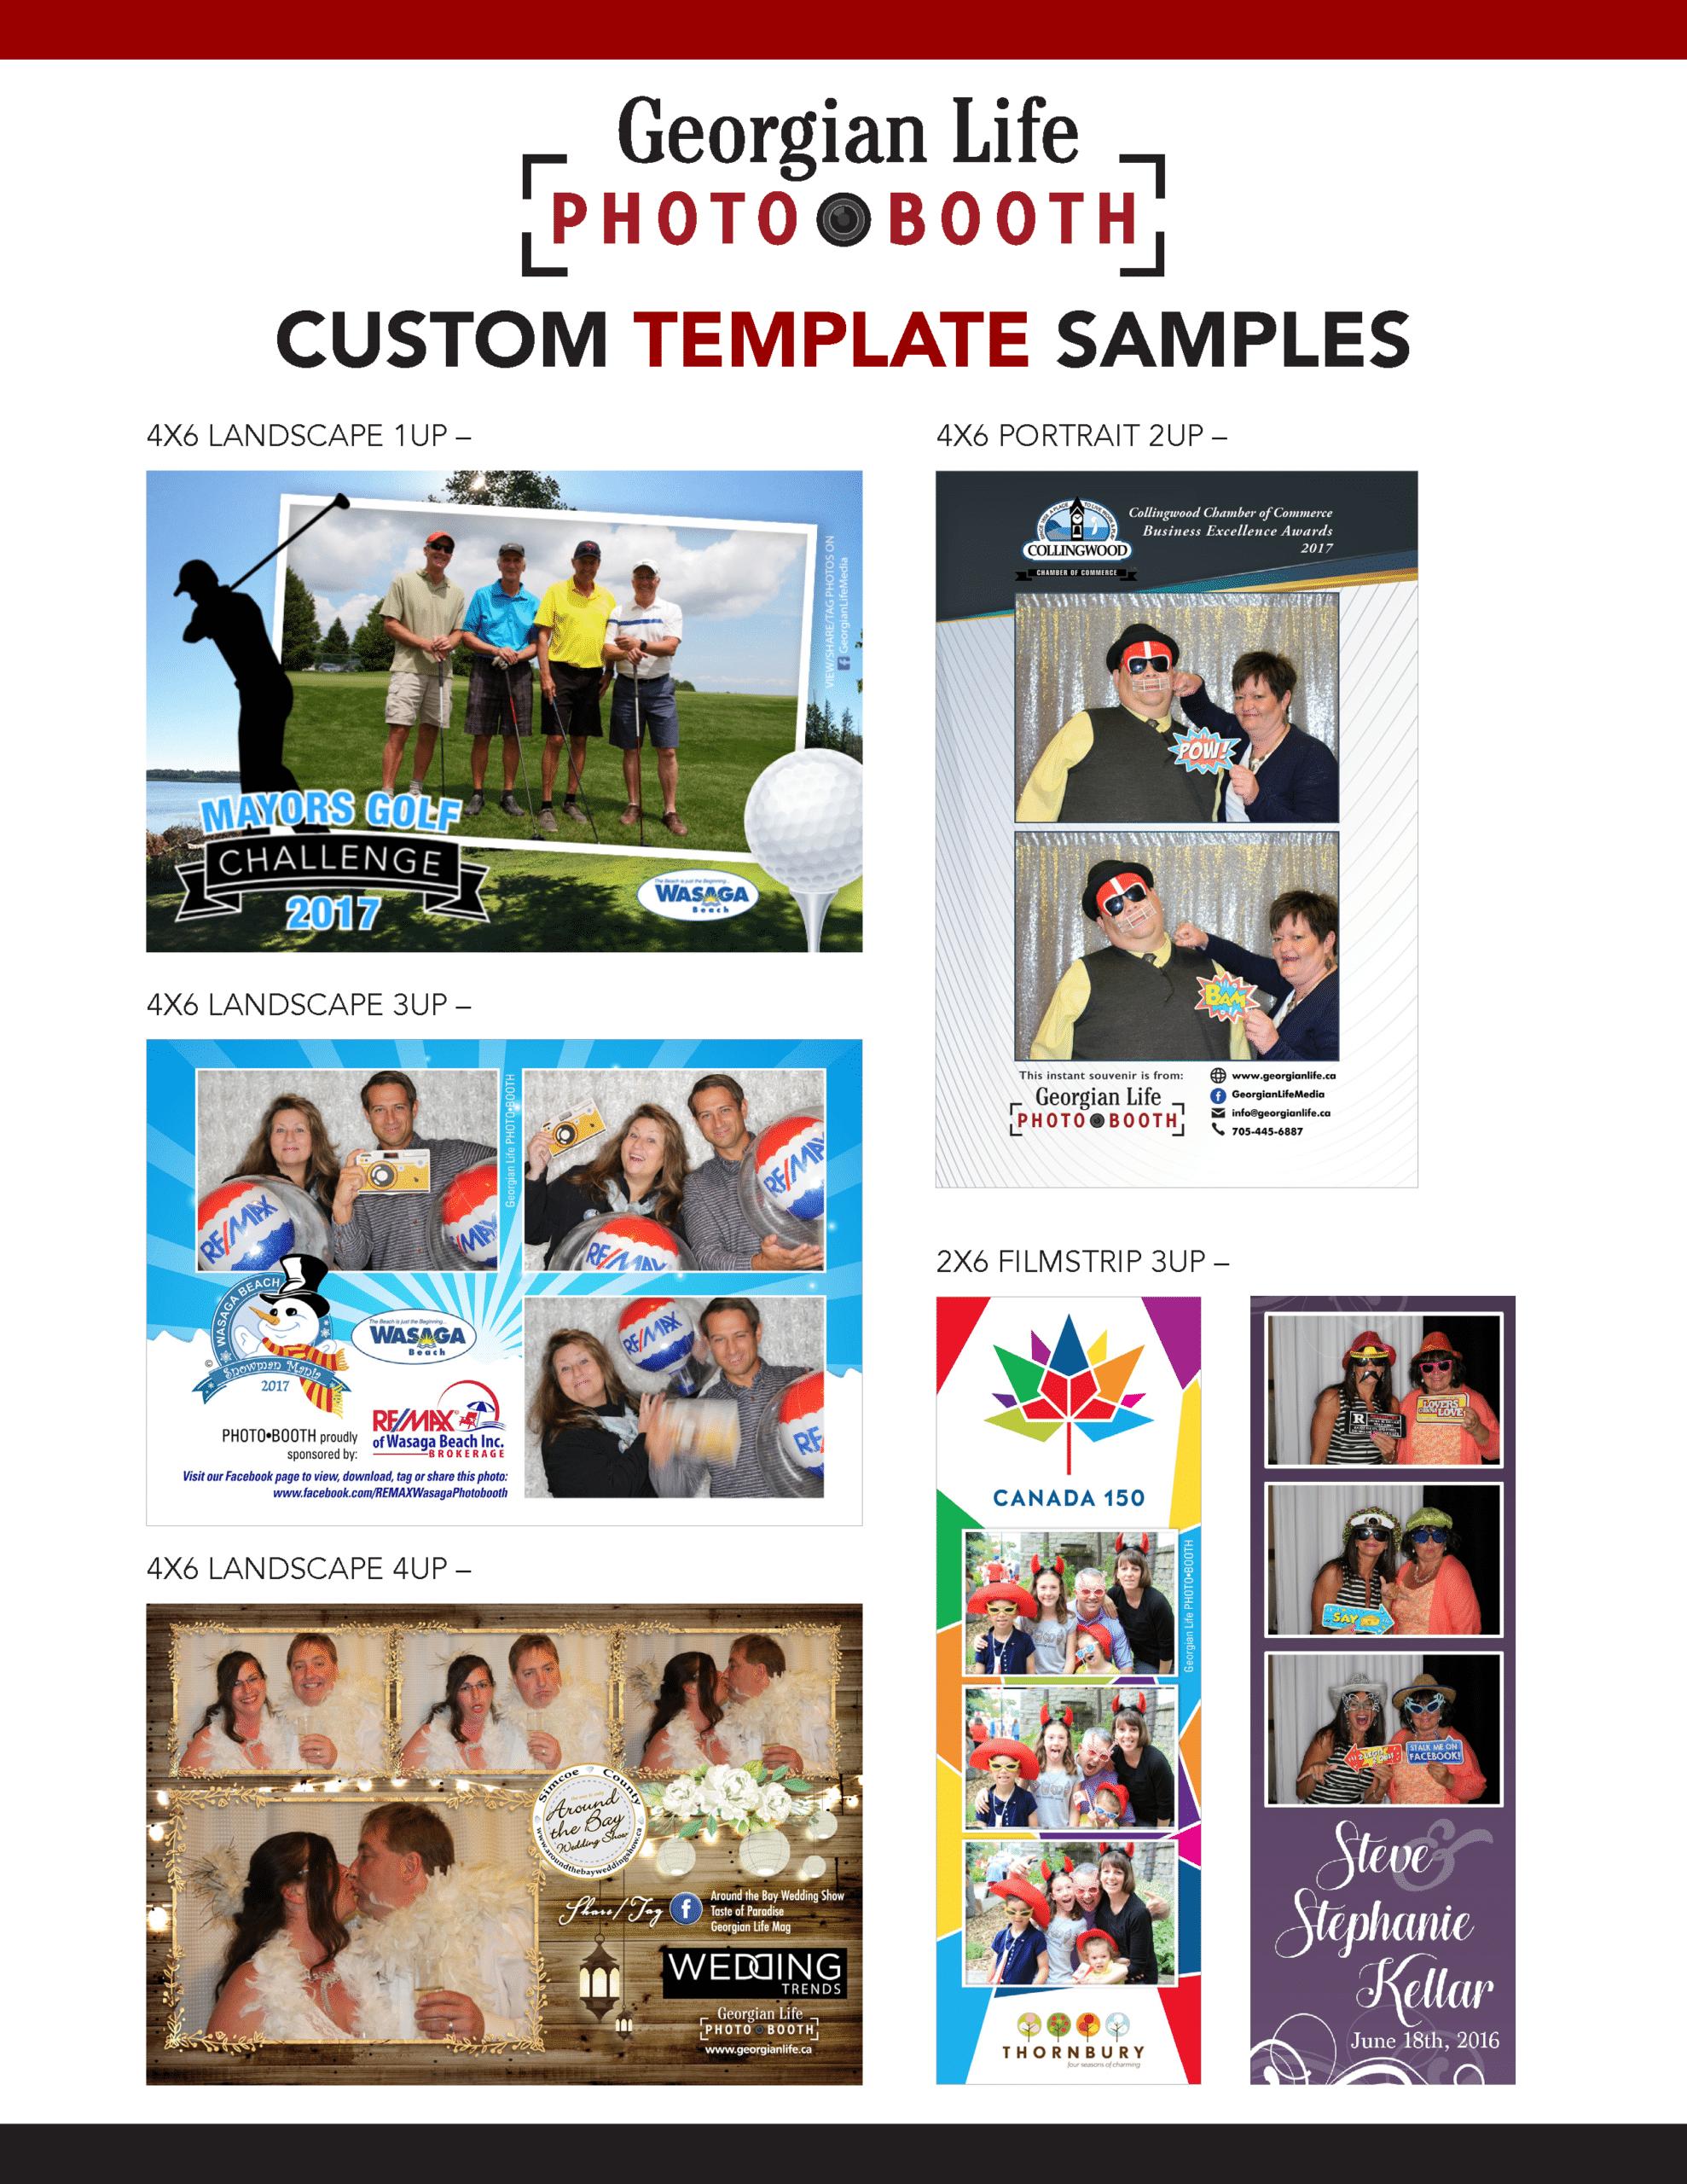 template samples georgian life media inc